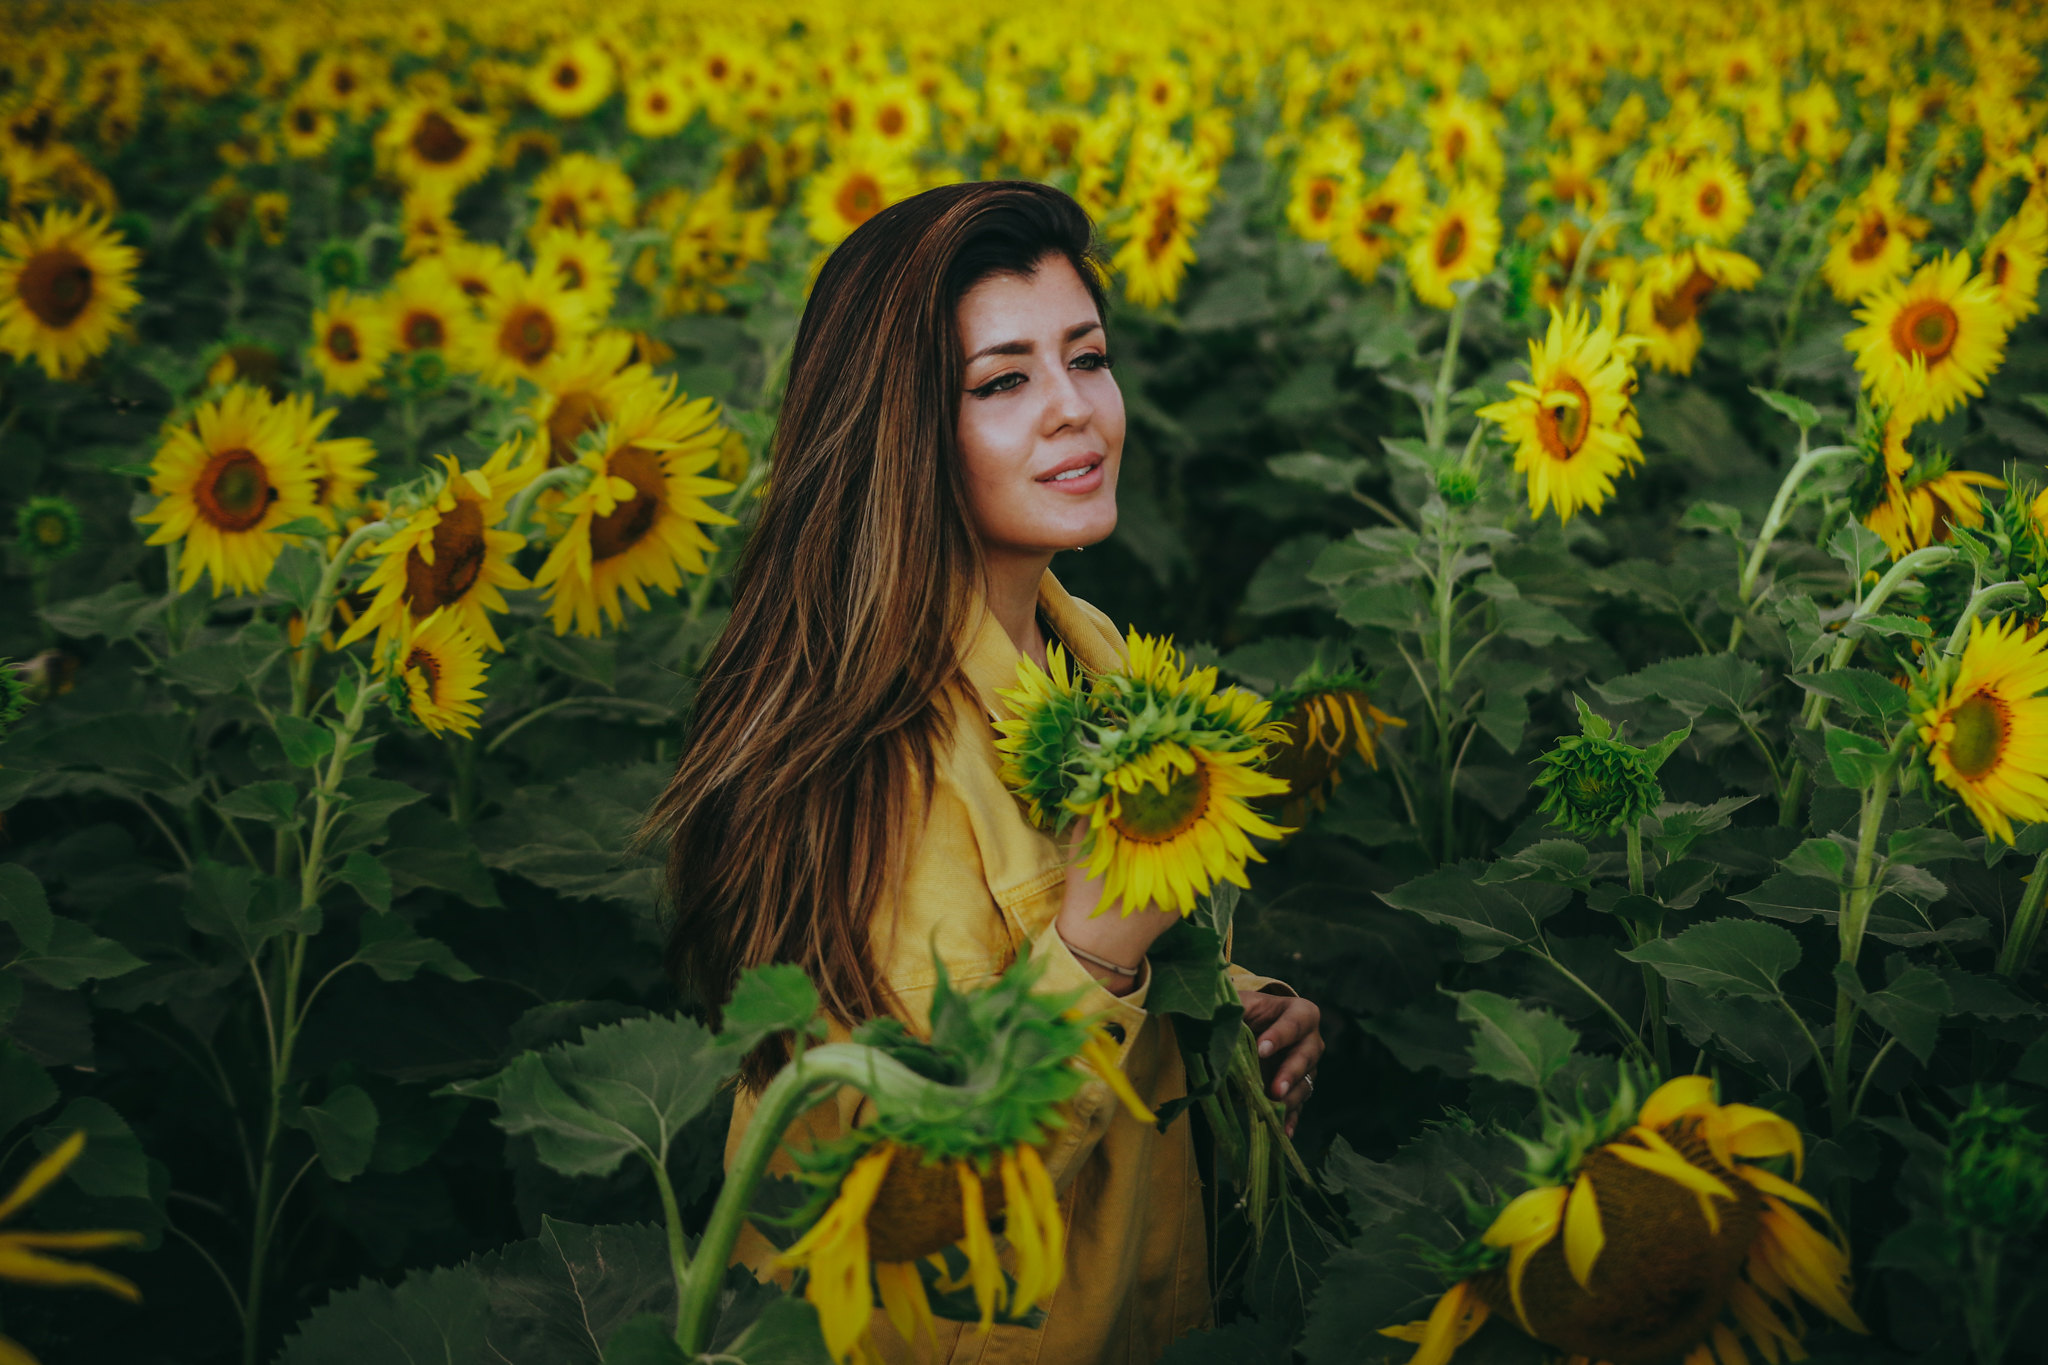 auringonkukkia-23